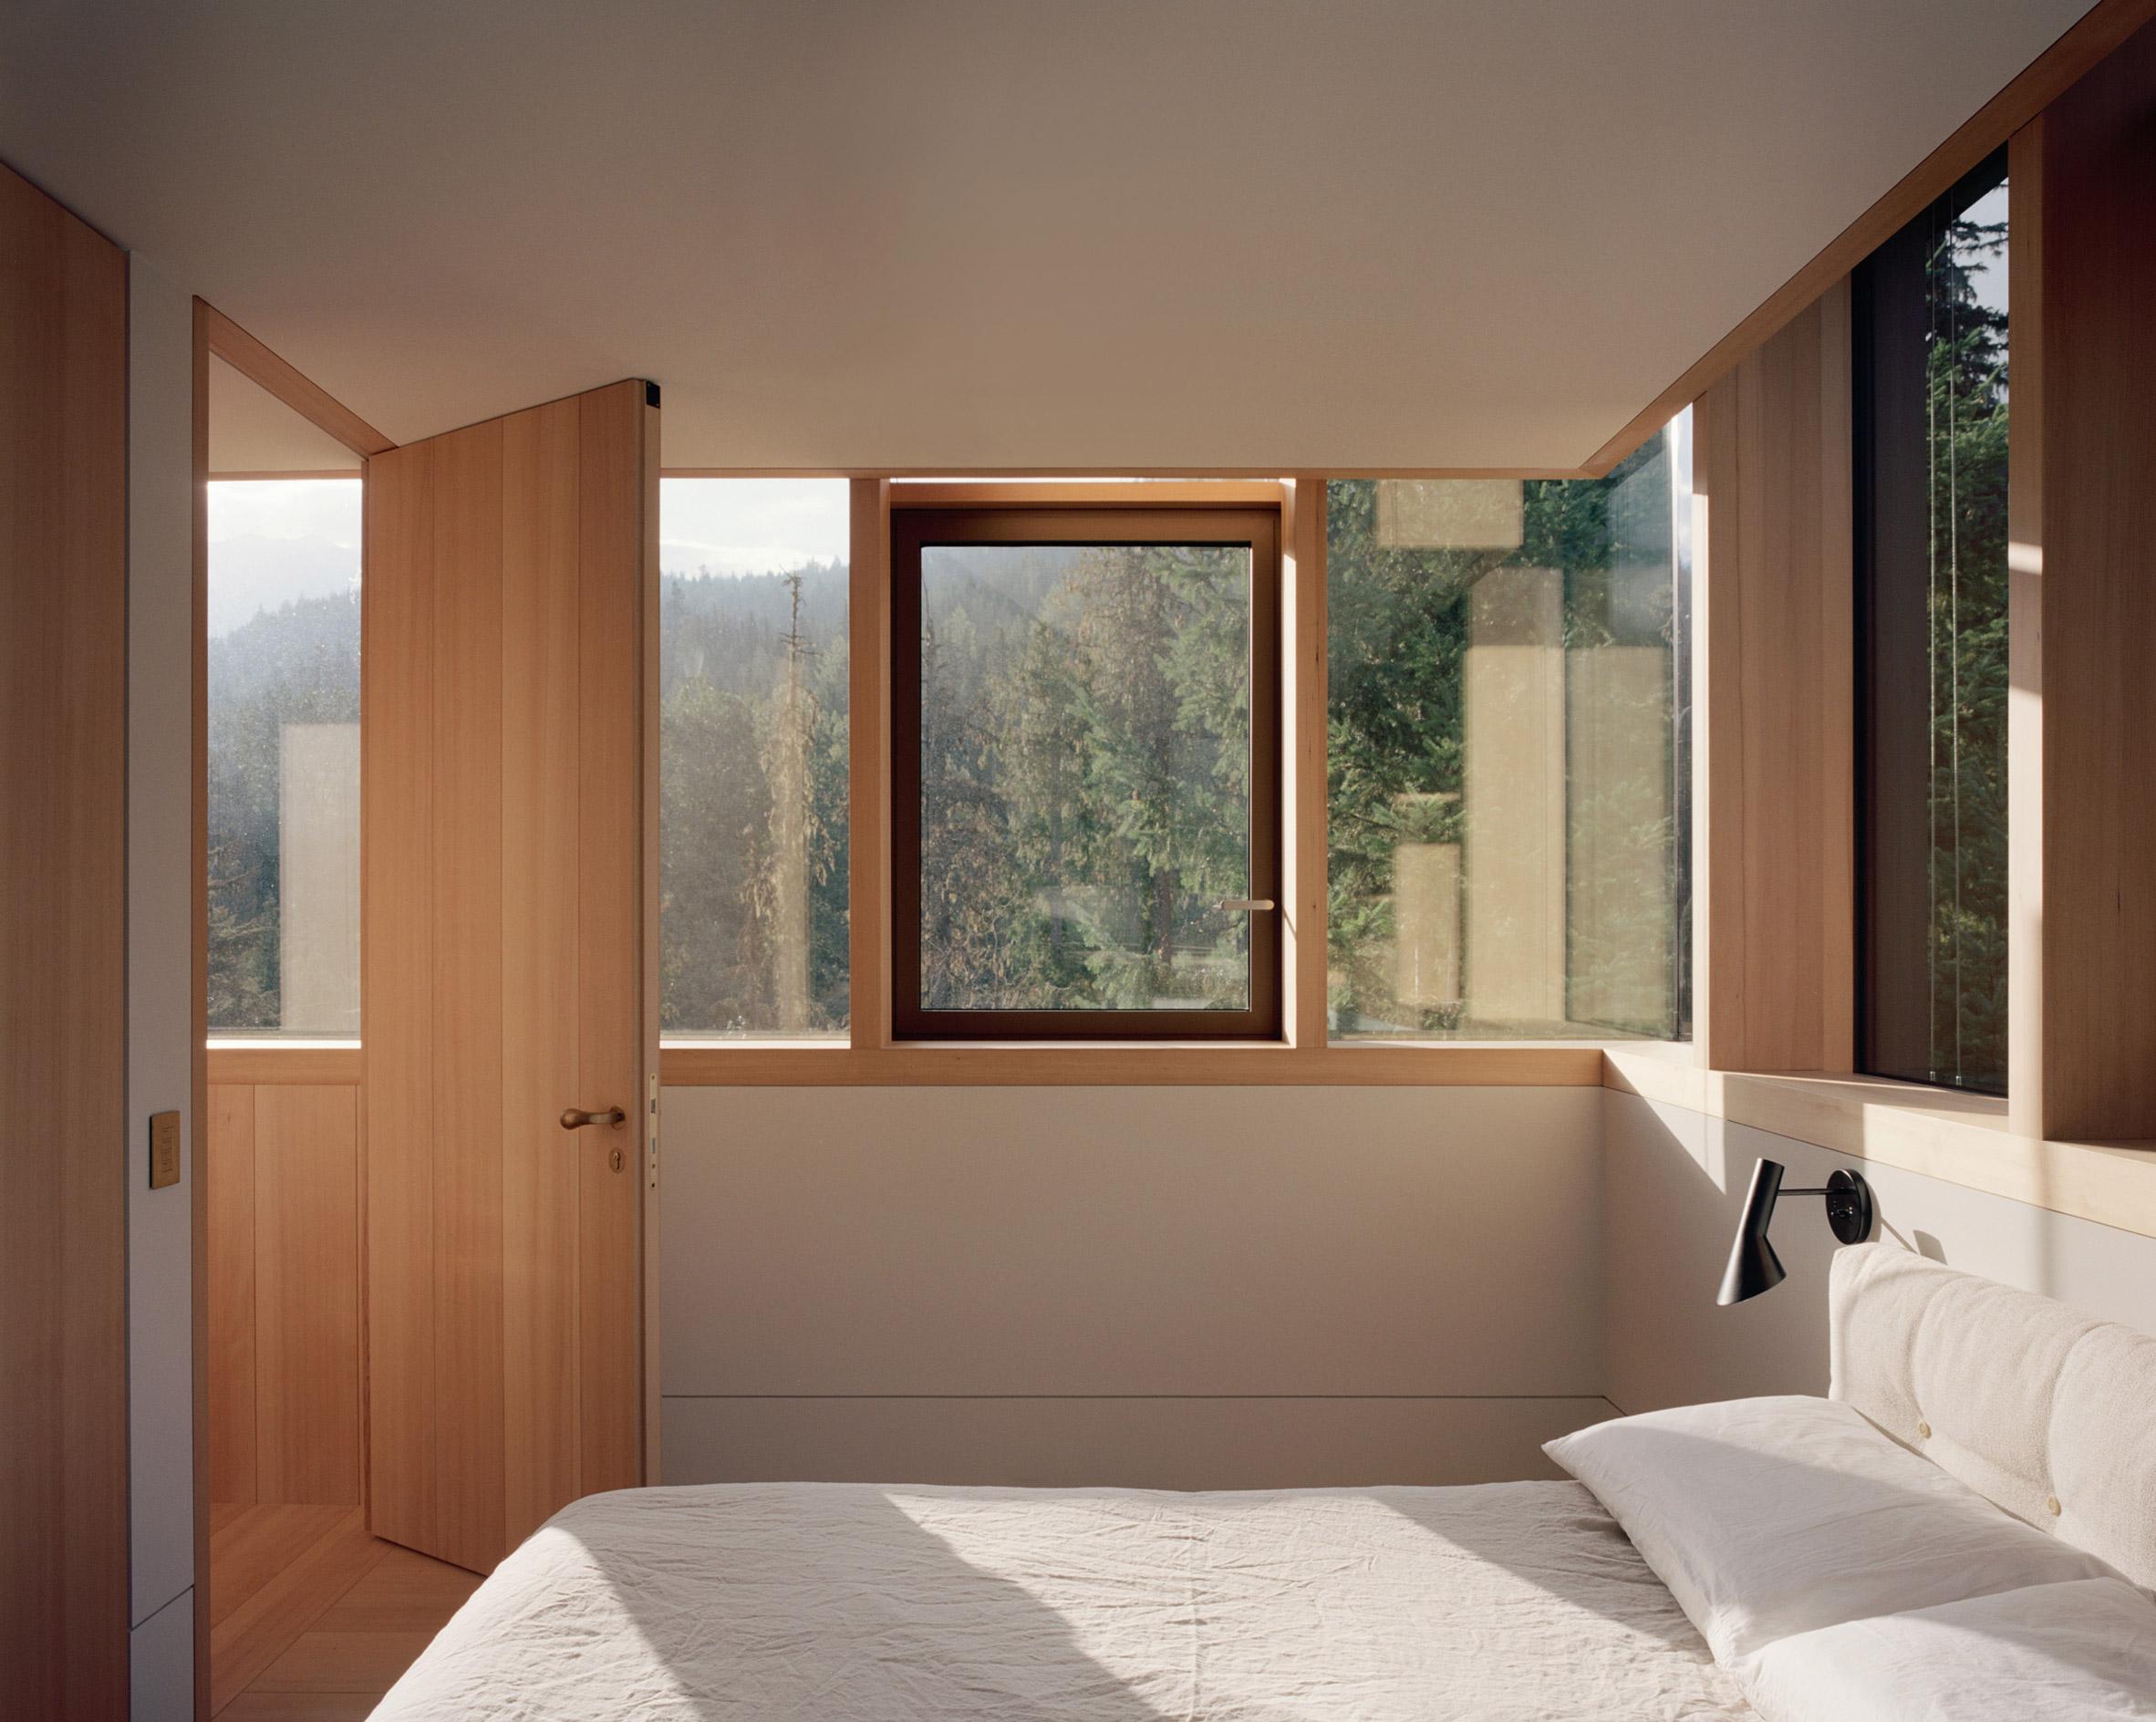 Bedroom, The Rock house in Whistler by Gort Scott